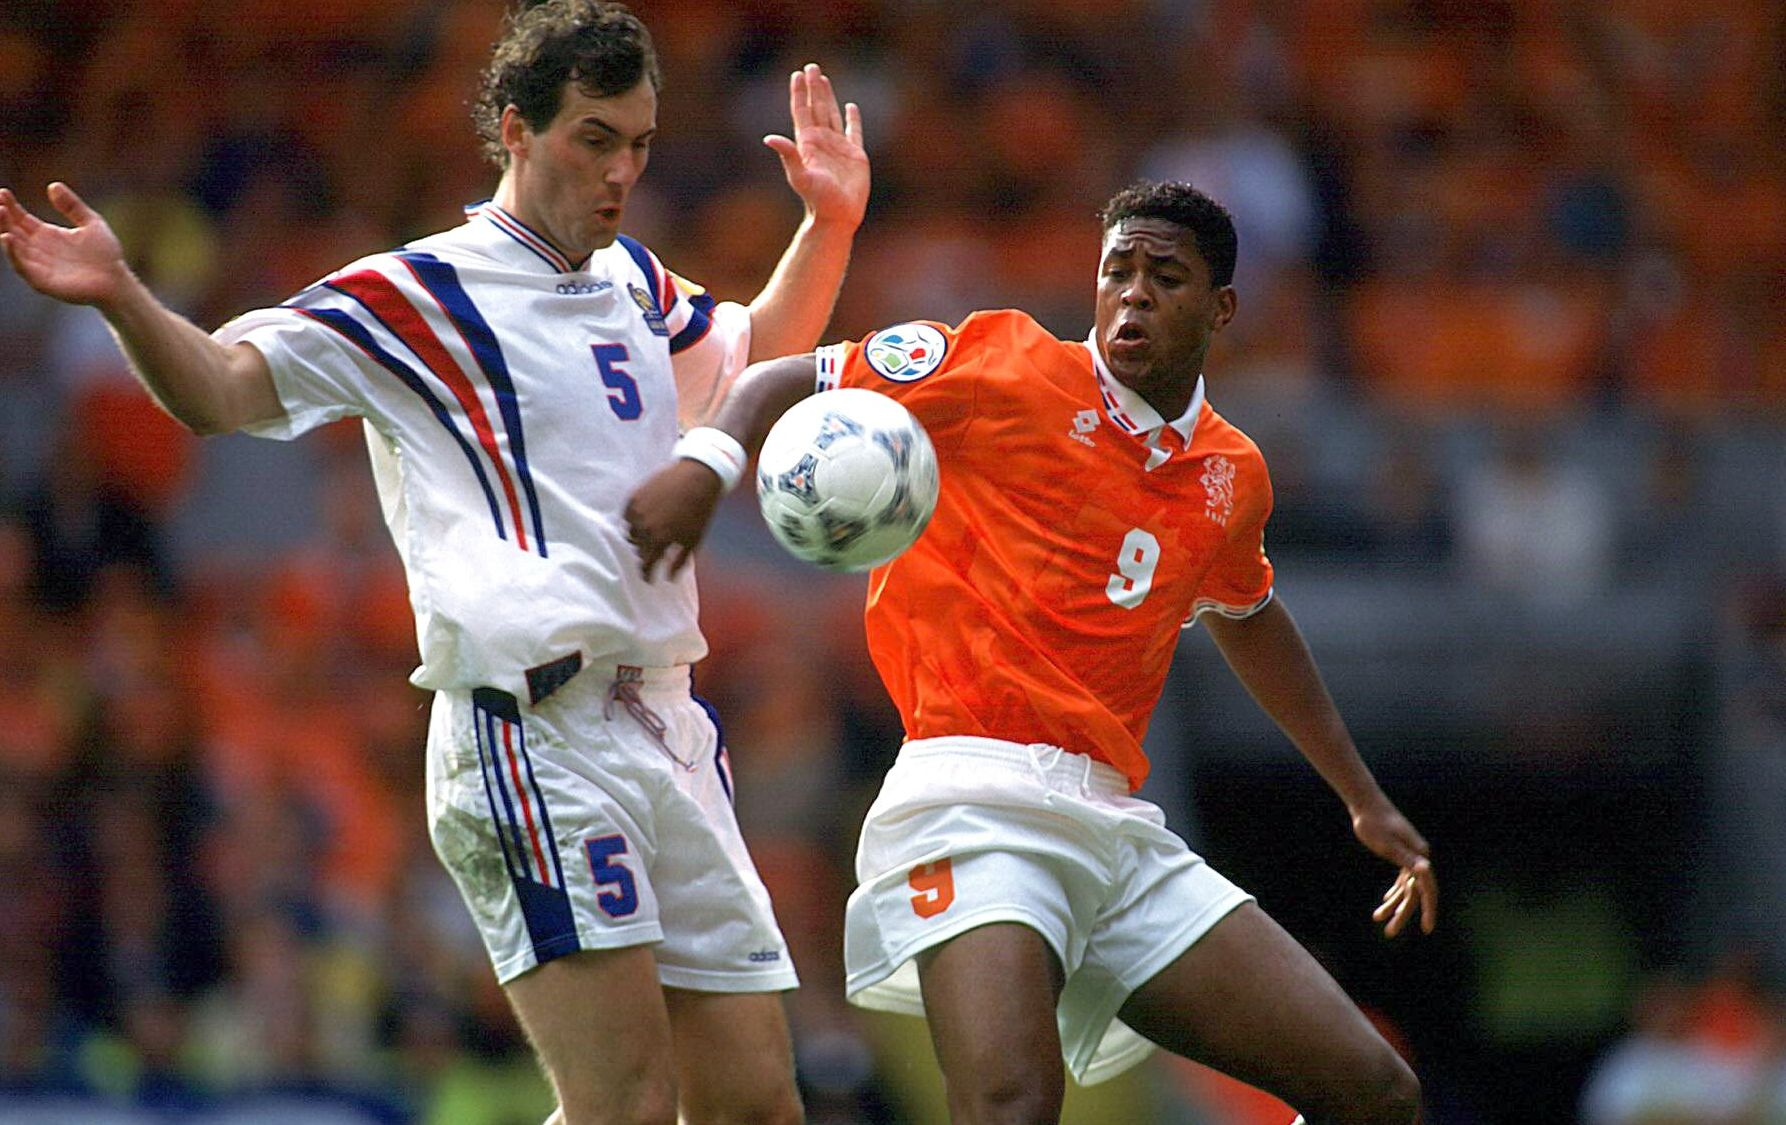 Football - Equipe de France - Humiliation, larmes, Cruyff : les France-Pays-Bas les plus marquants